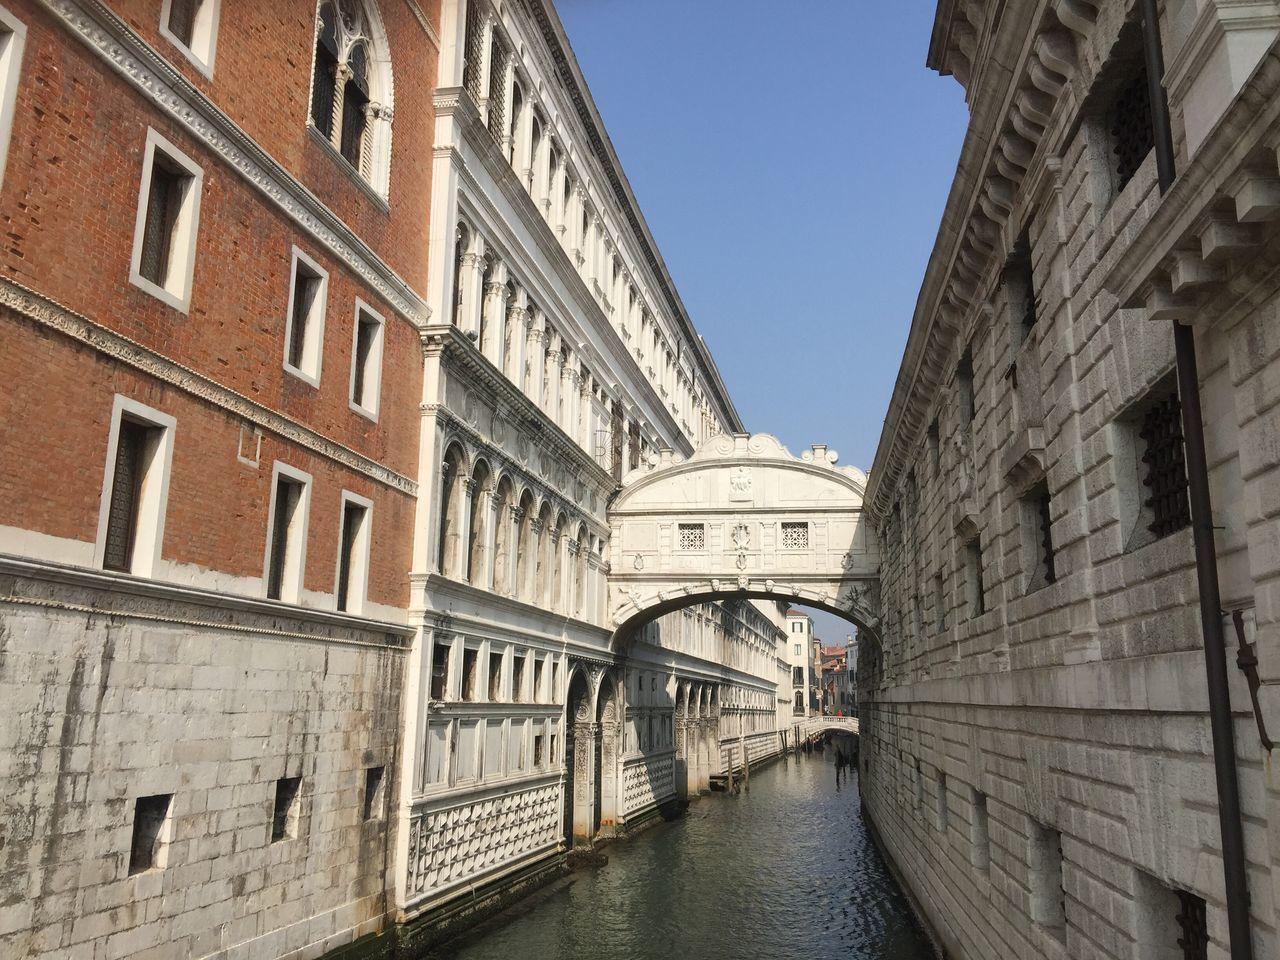 'Street' of Venice. (3) Italian Photos Venice Built Structure Building Exterior Architecture Canal Bridge - Man Made Structure Clear Sky City Life Footbridge